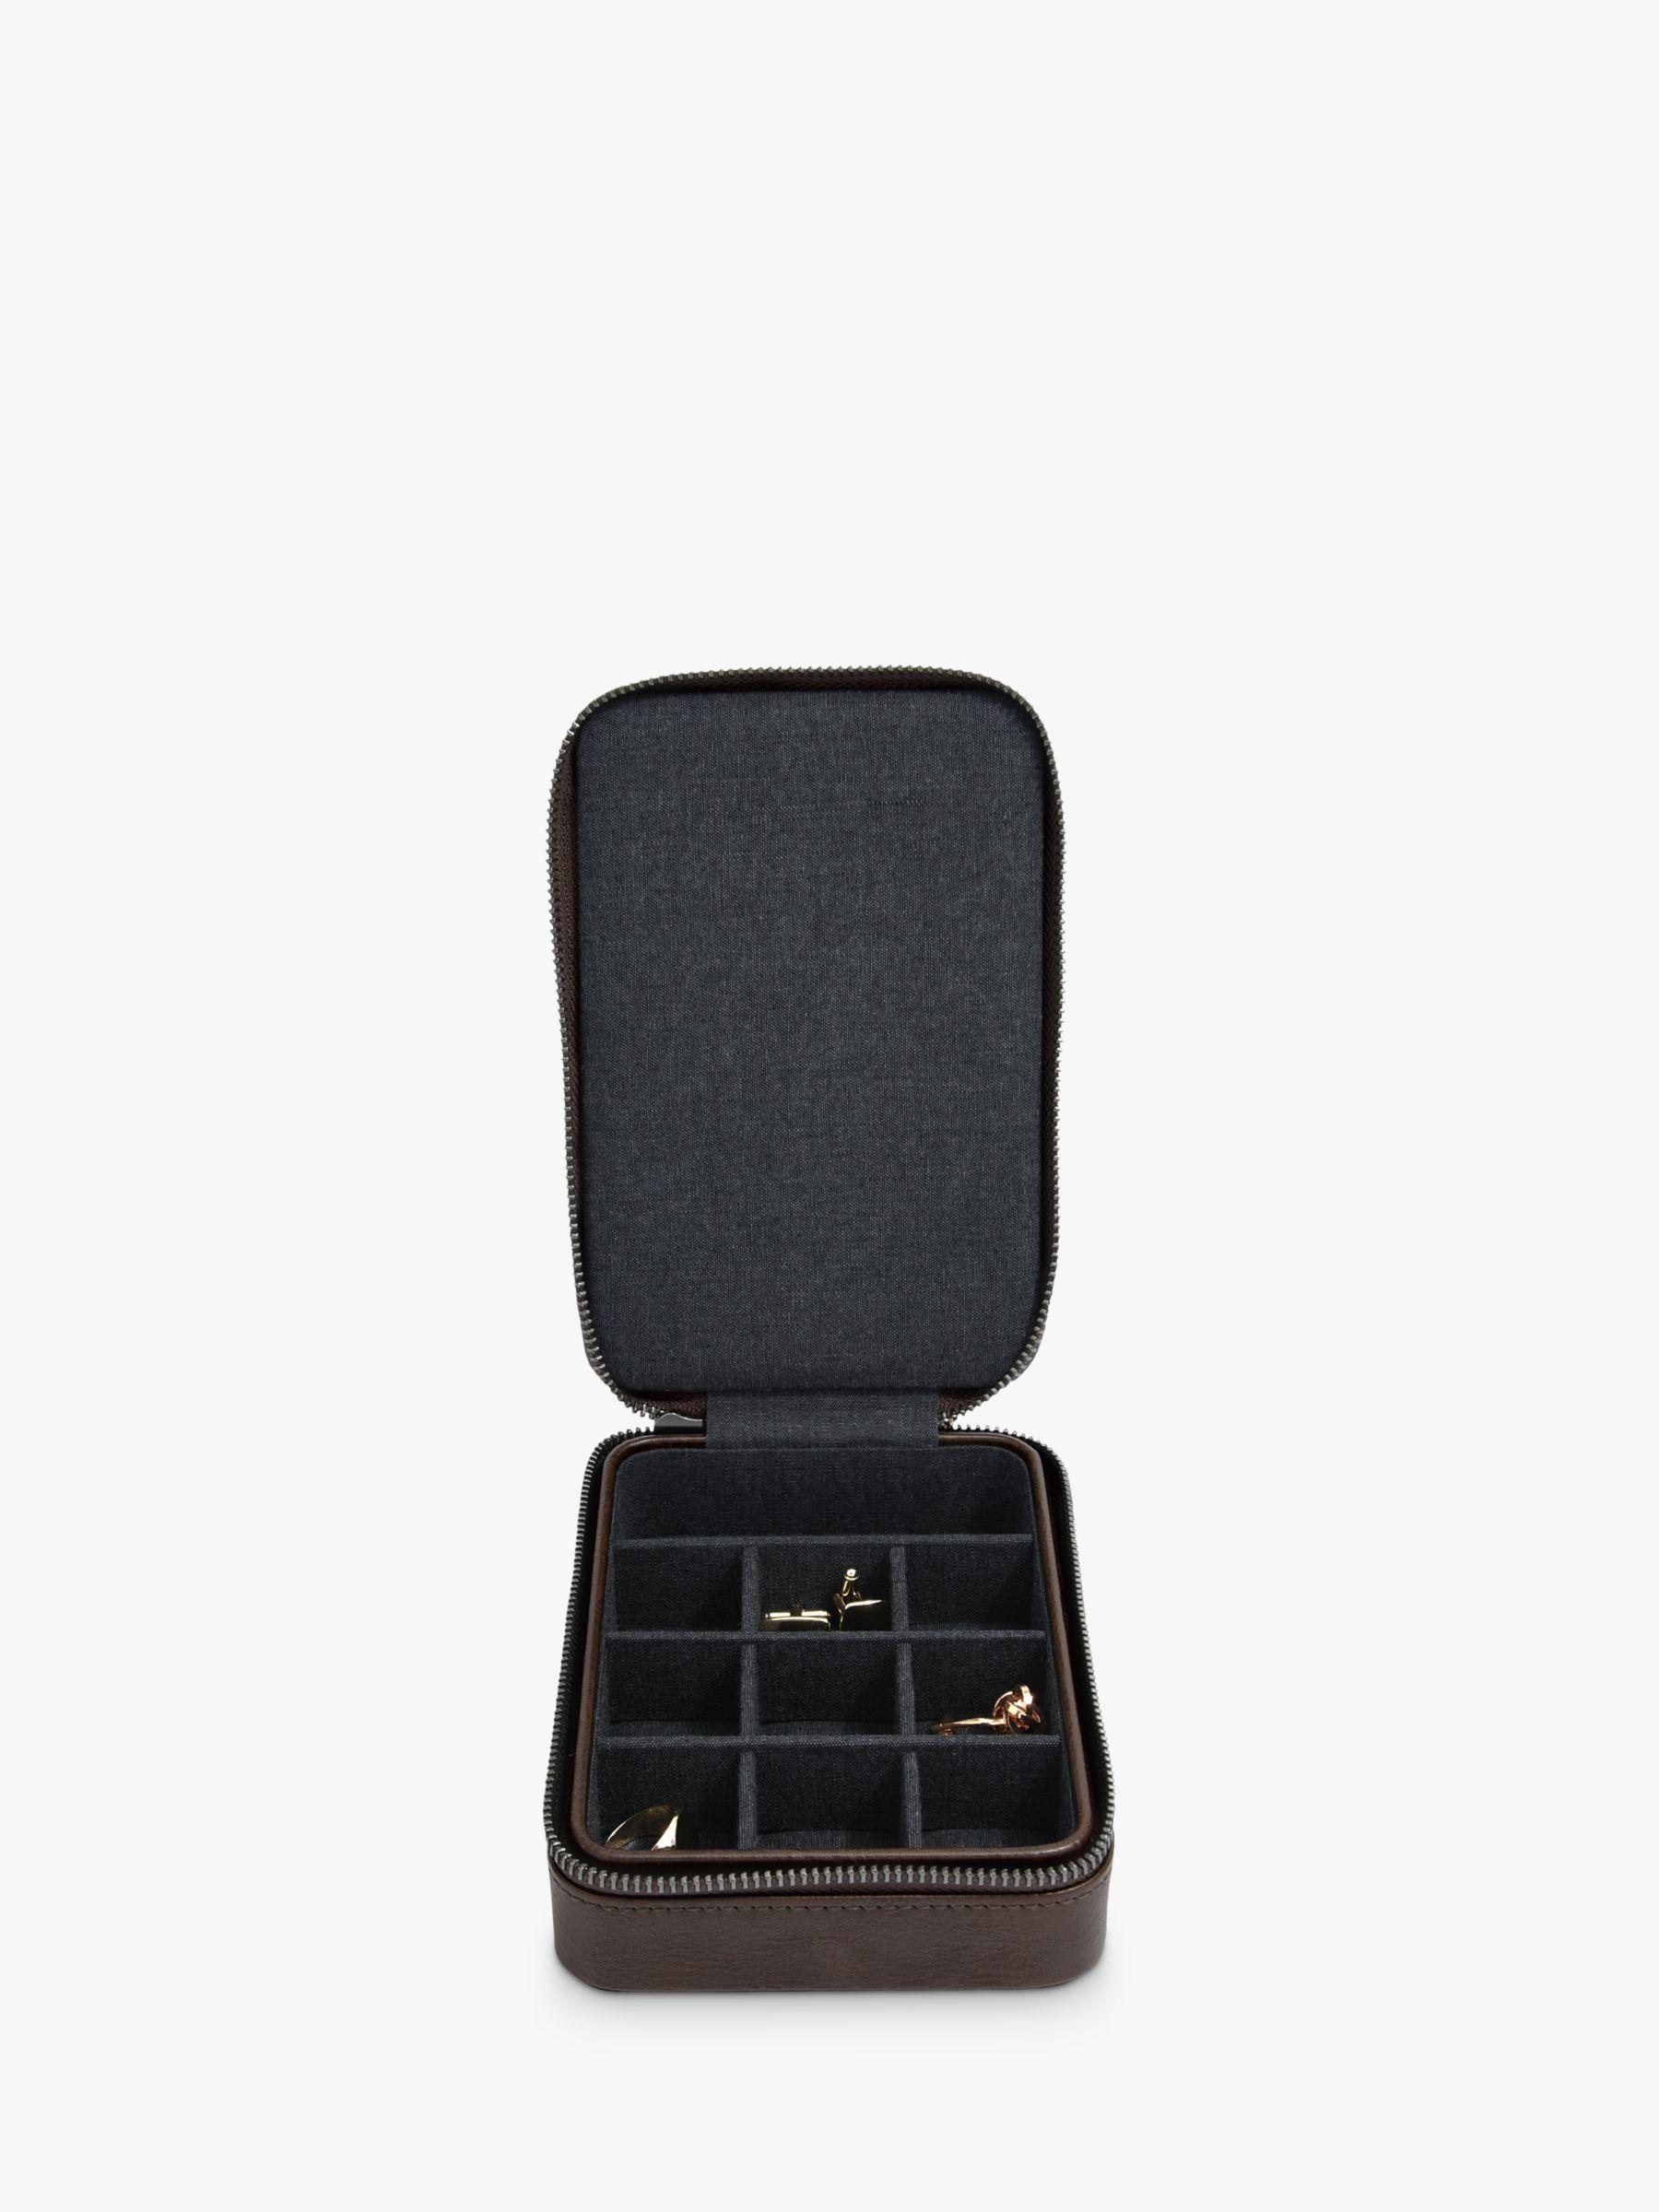 Stackers Stackers Men's Zipped Cufflink Box